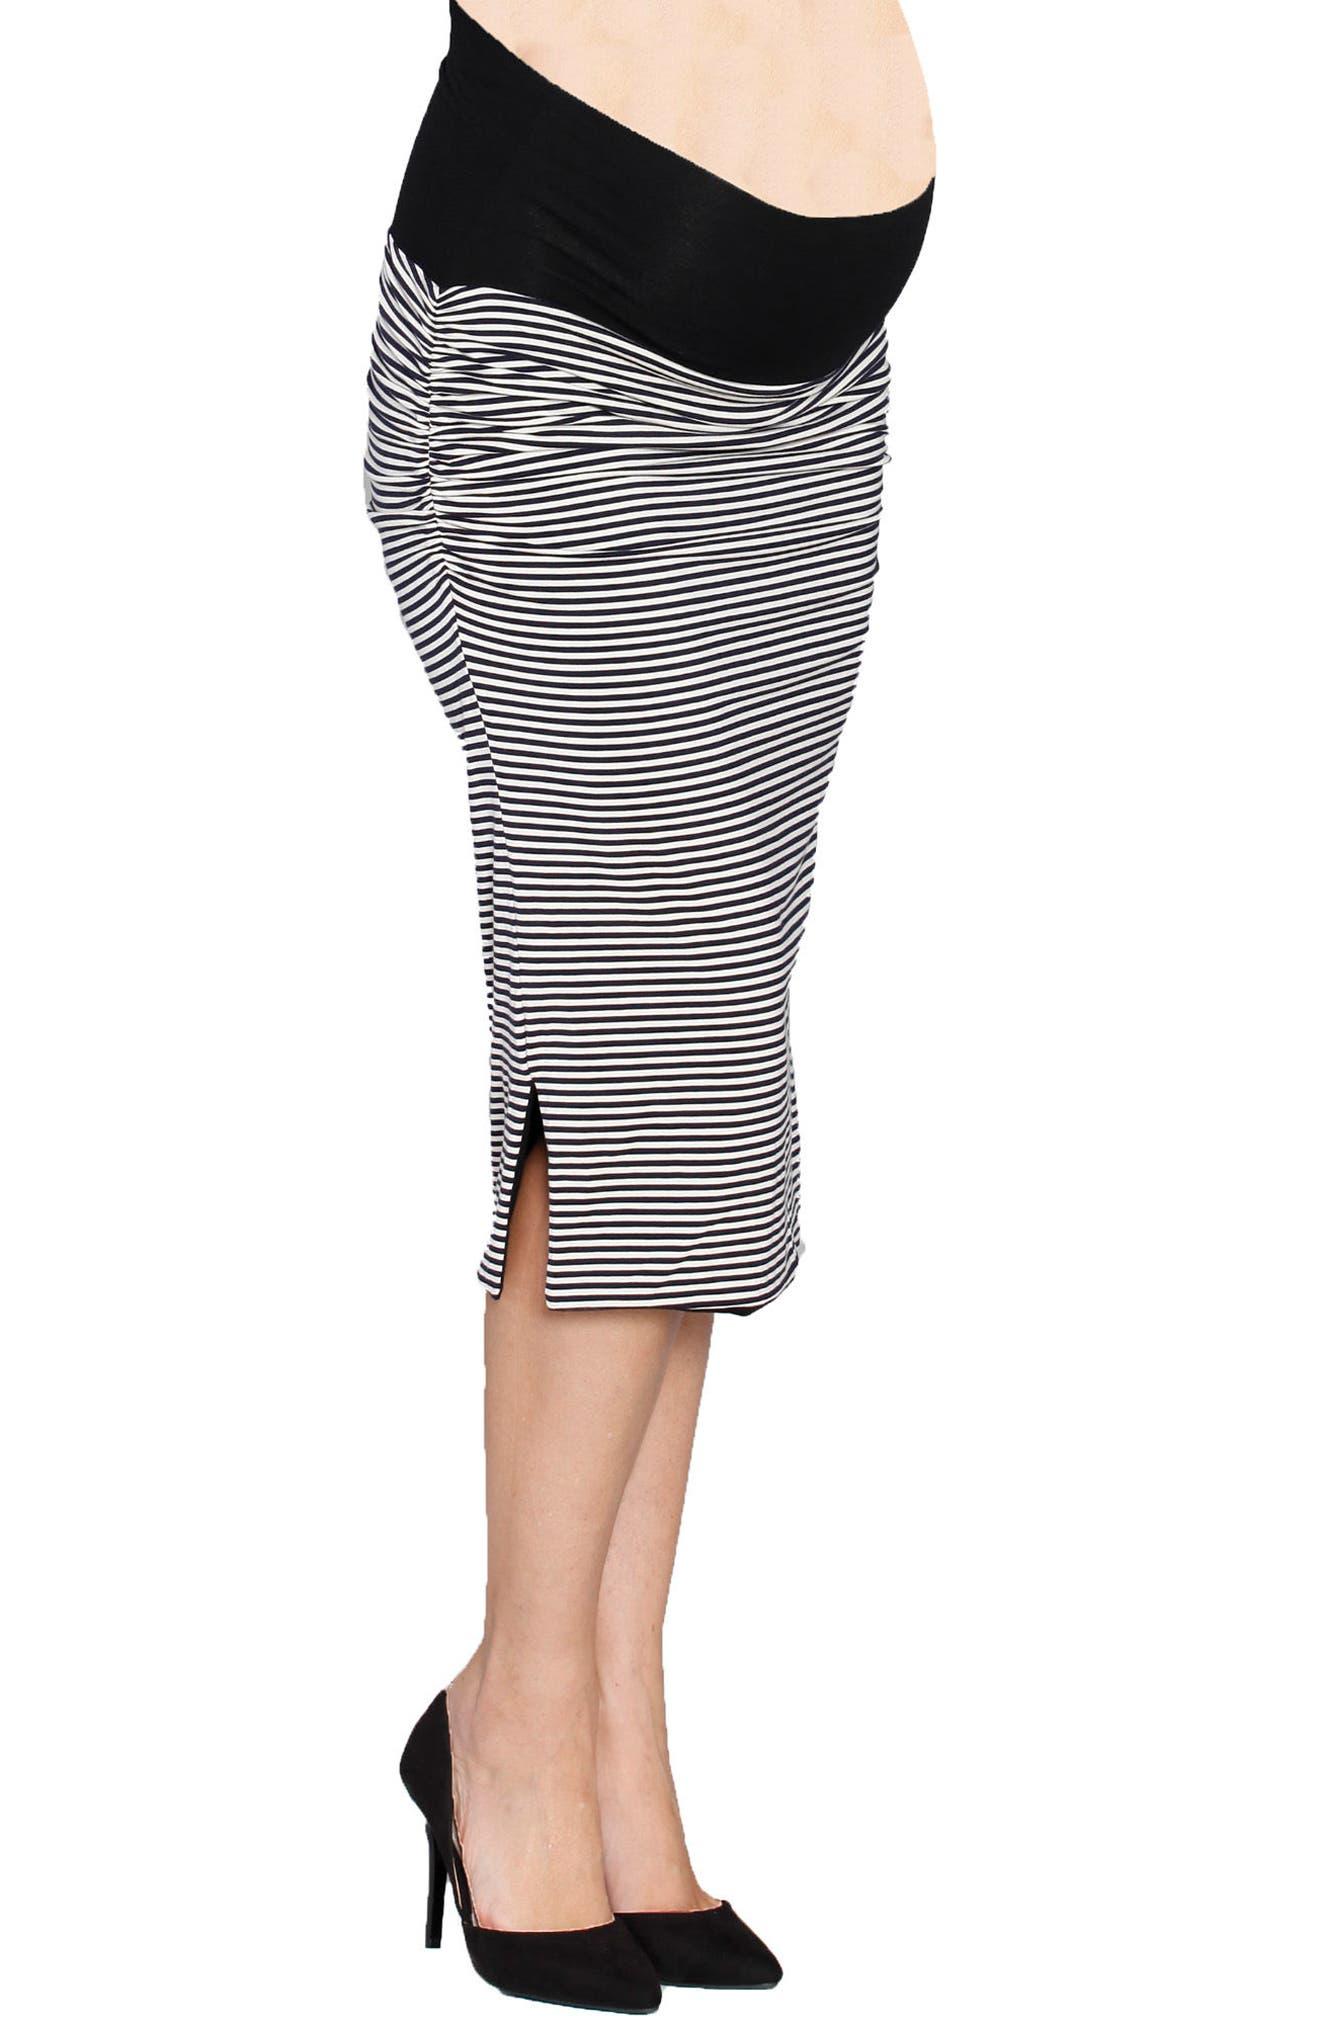 Reversible Maternity Skirt,                             Main thumbnail 1, color,                             Stripes